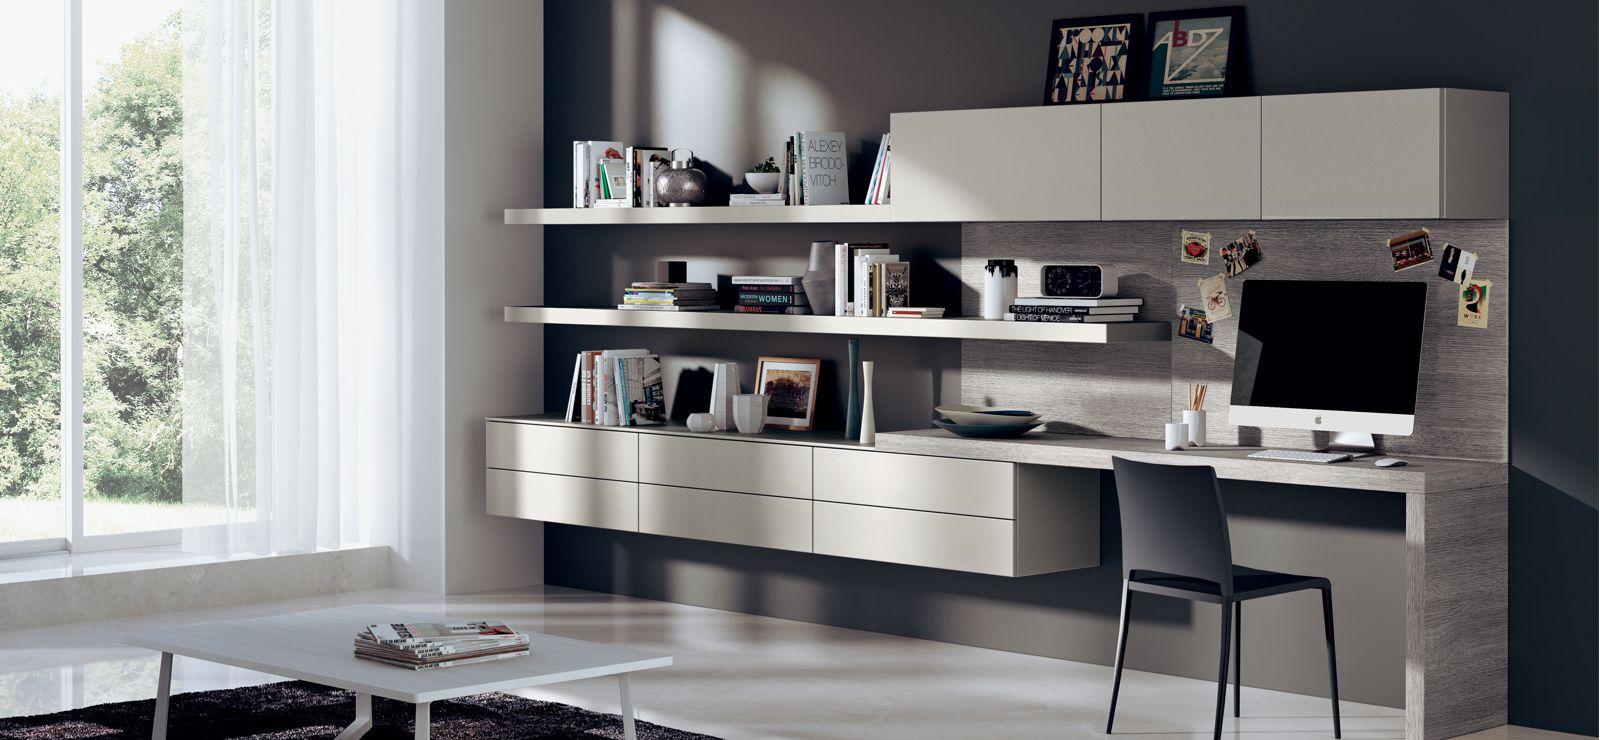 Living Room Scavolini USA | Italian Living Room Decoration Ideas and ...